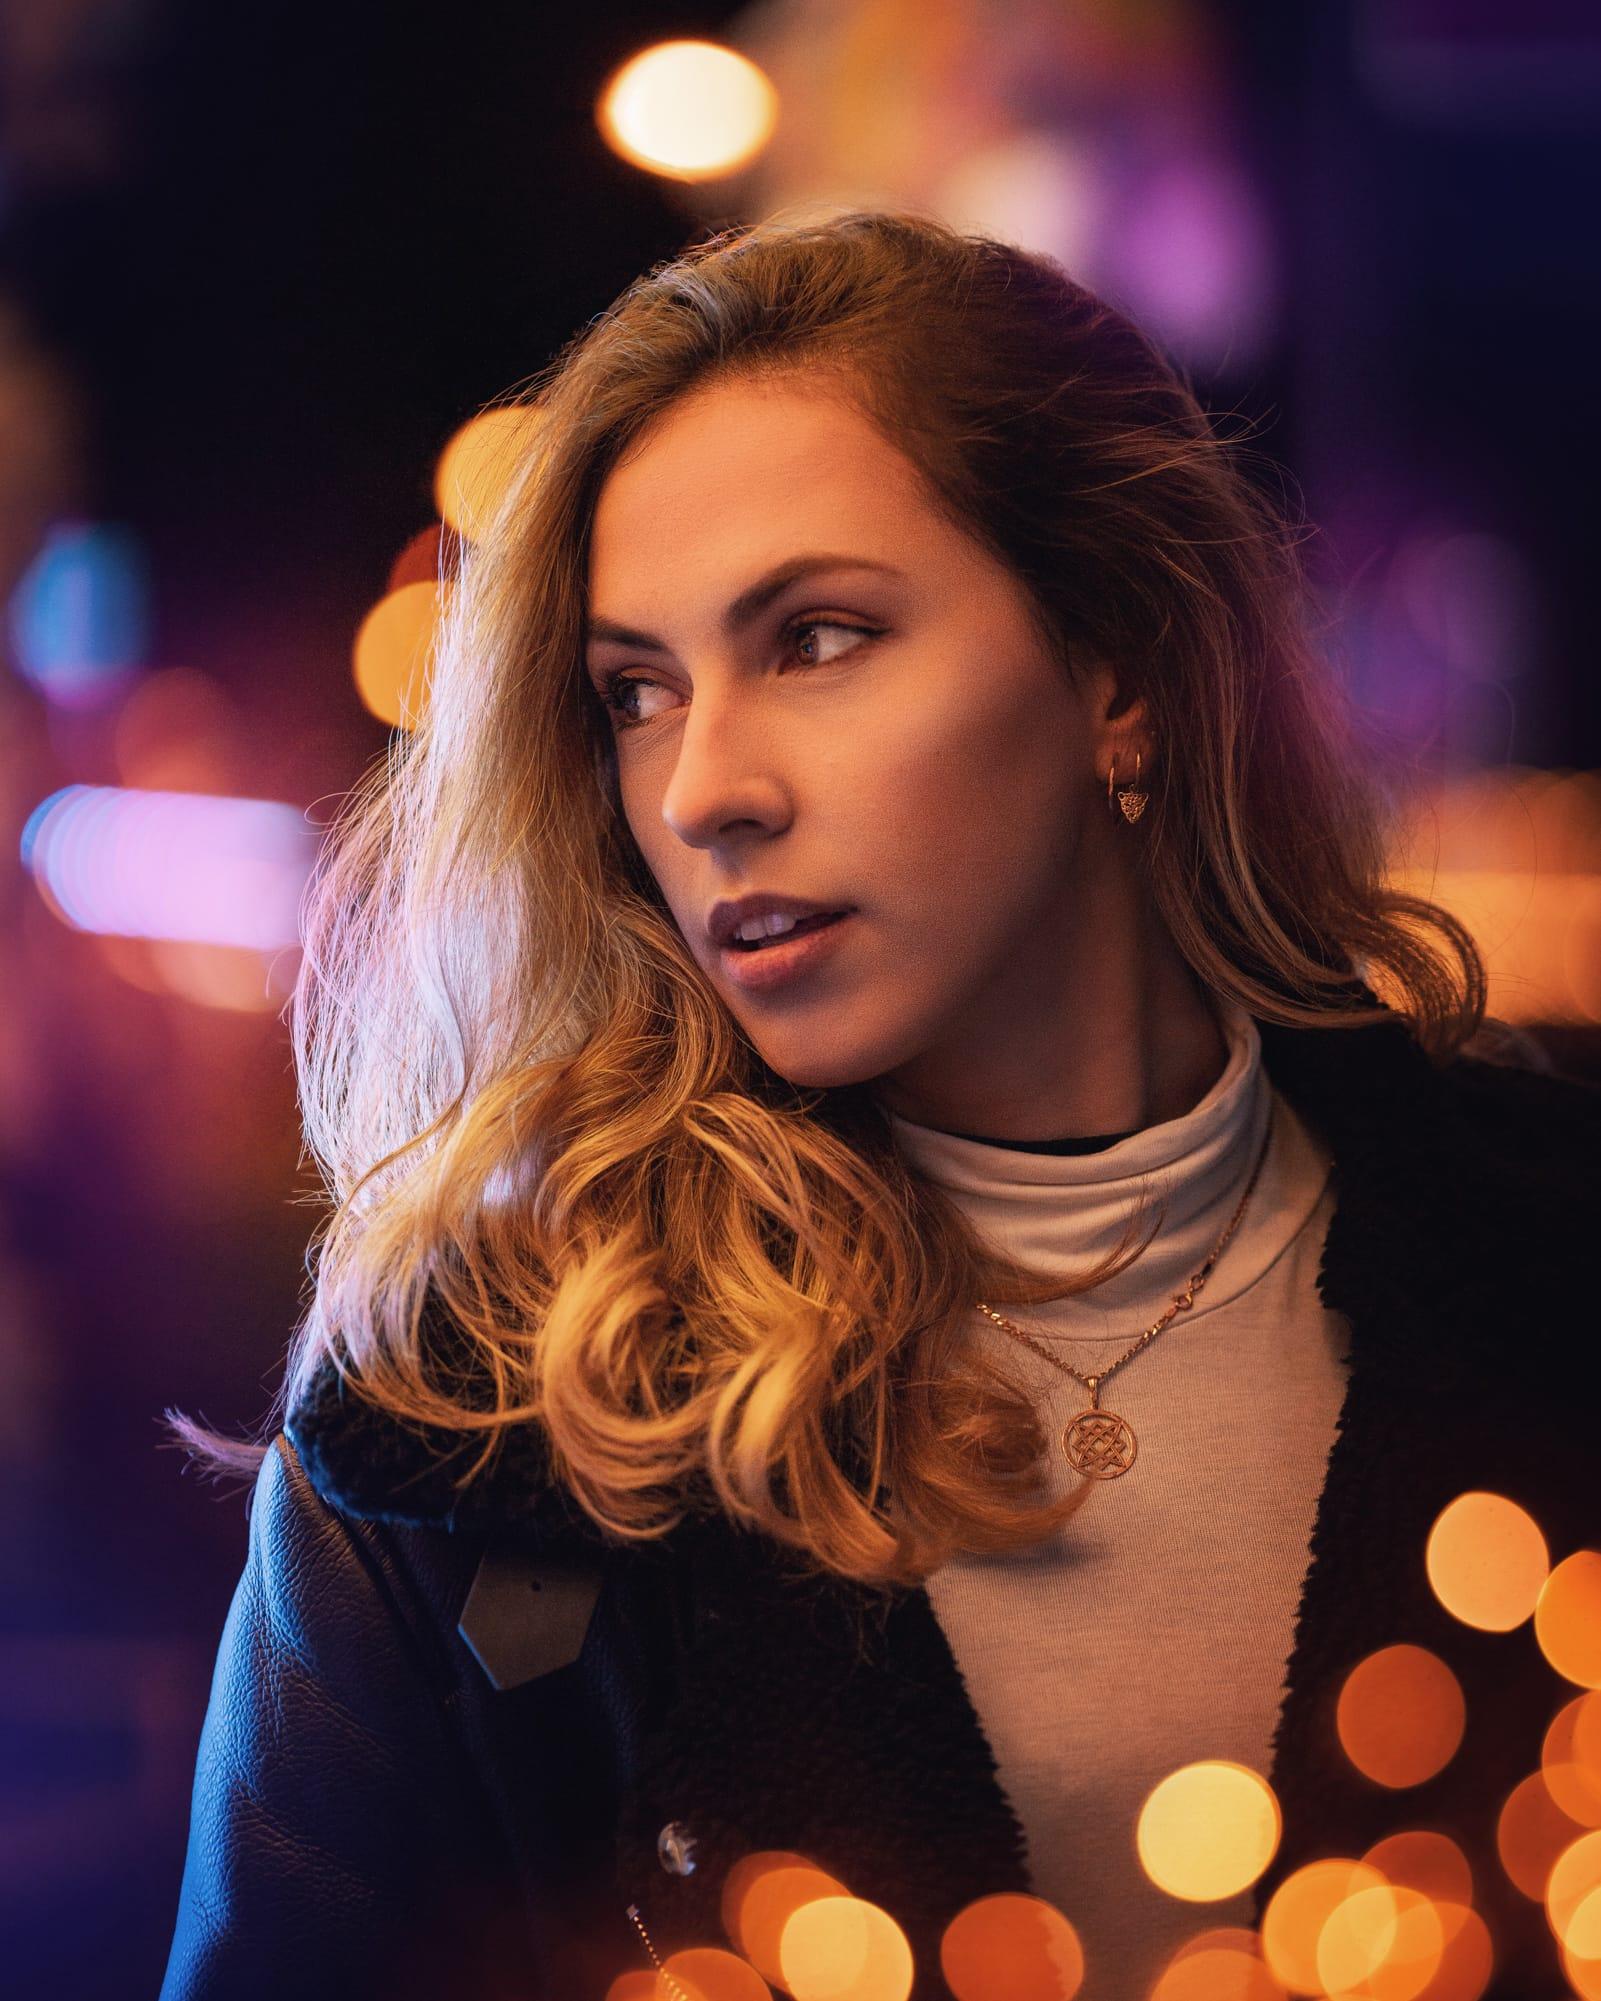 Daniela – Portraitshooting in Hannover